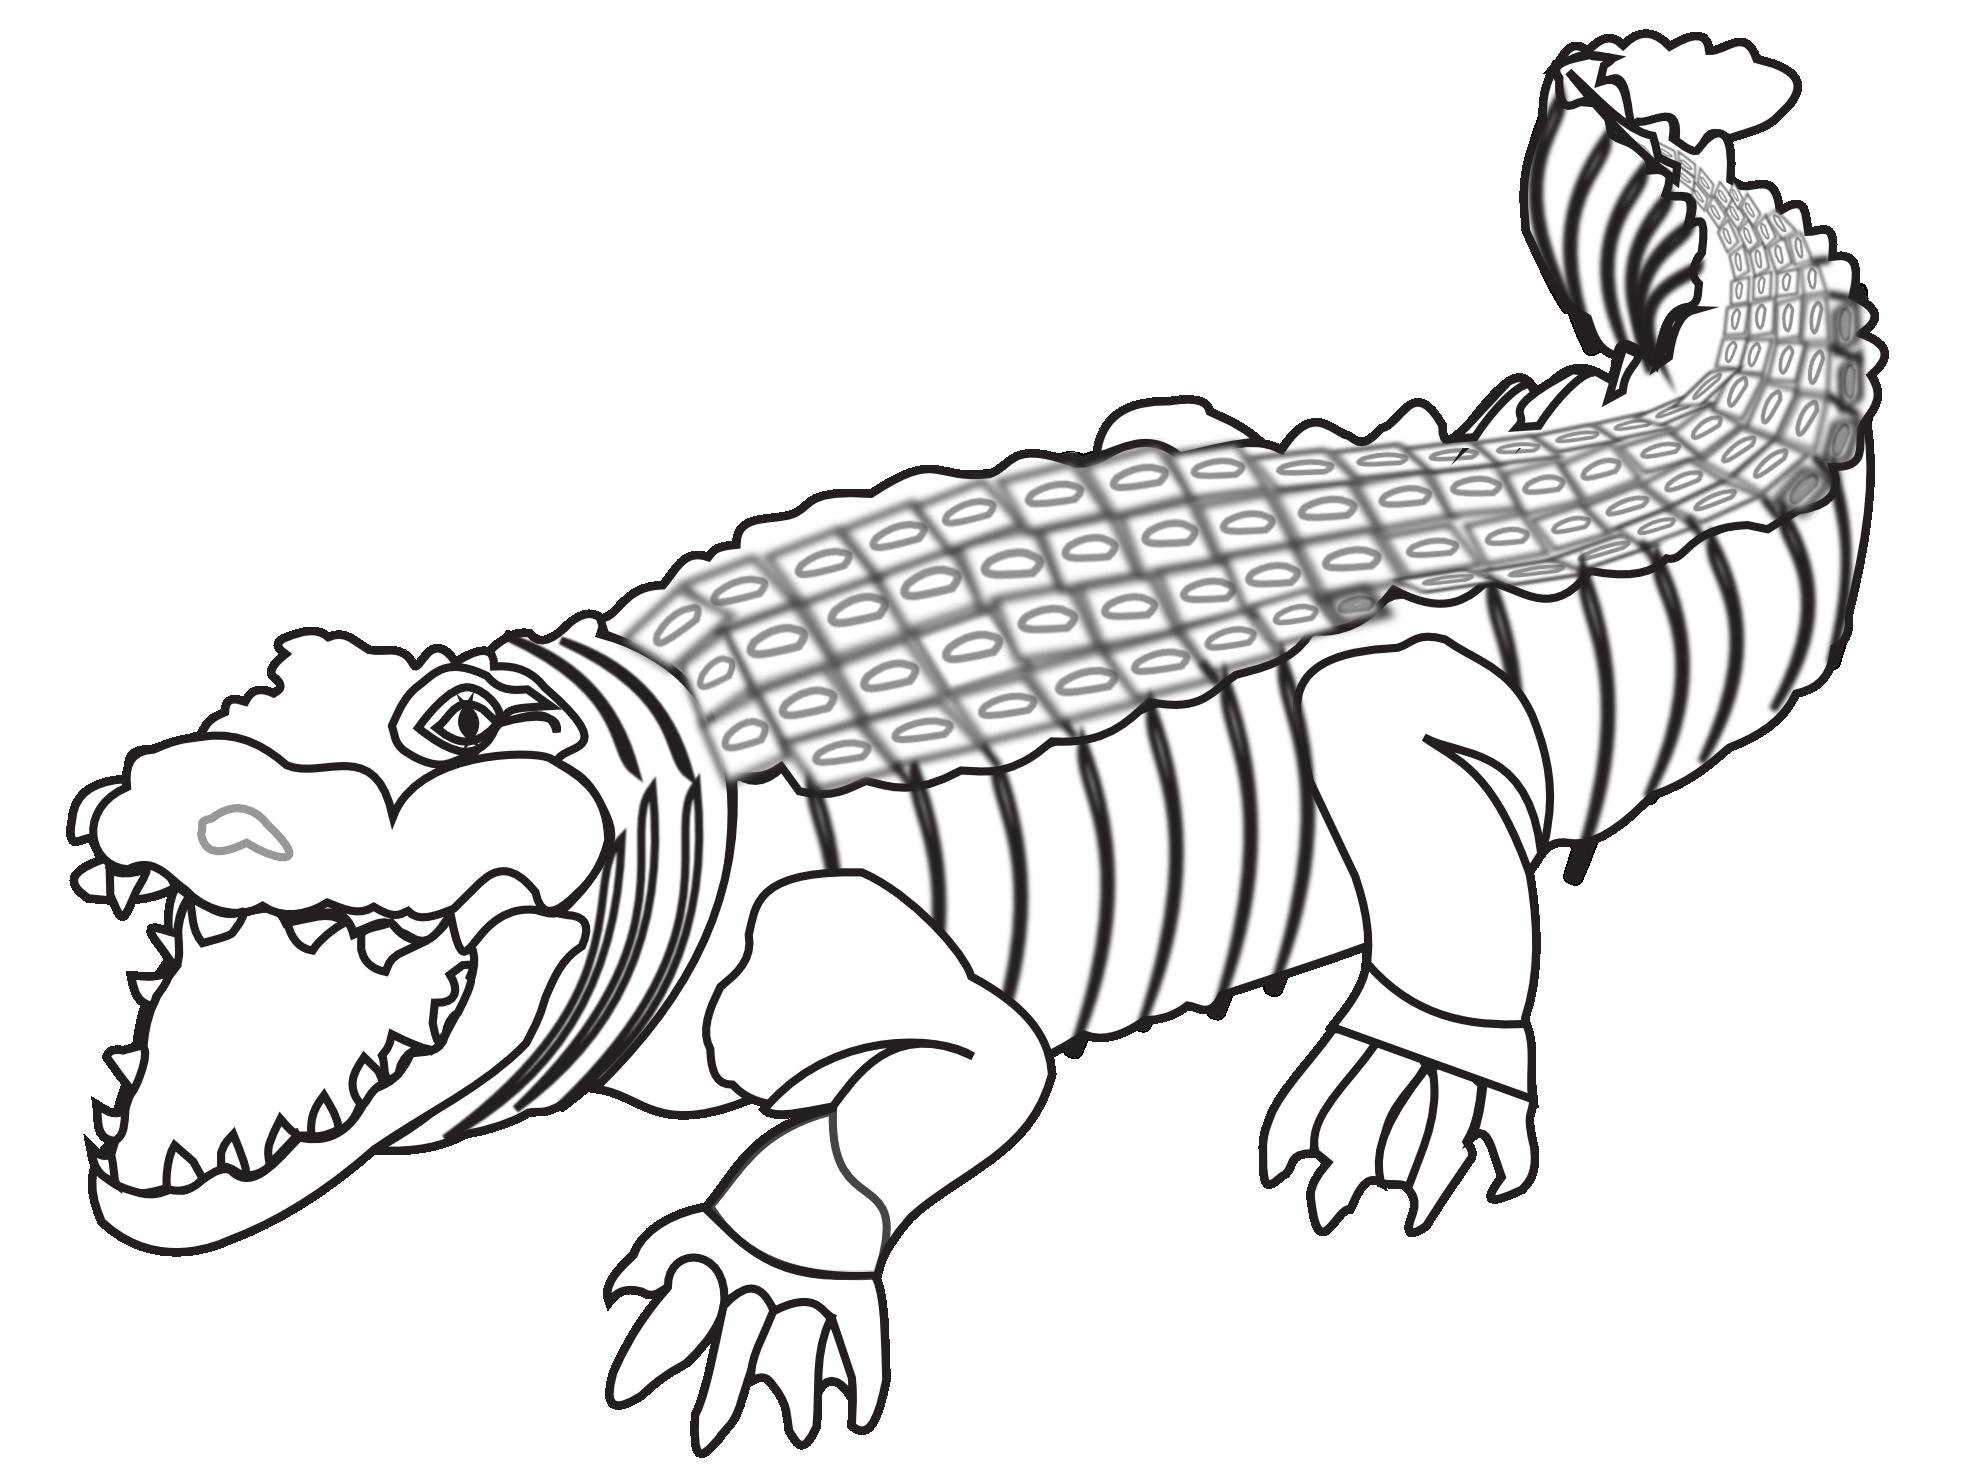 PNG Crocodile Black And White - 133438